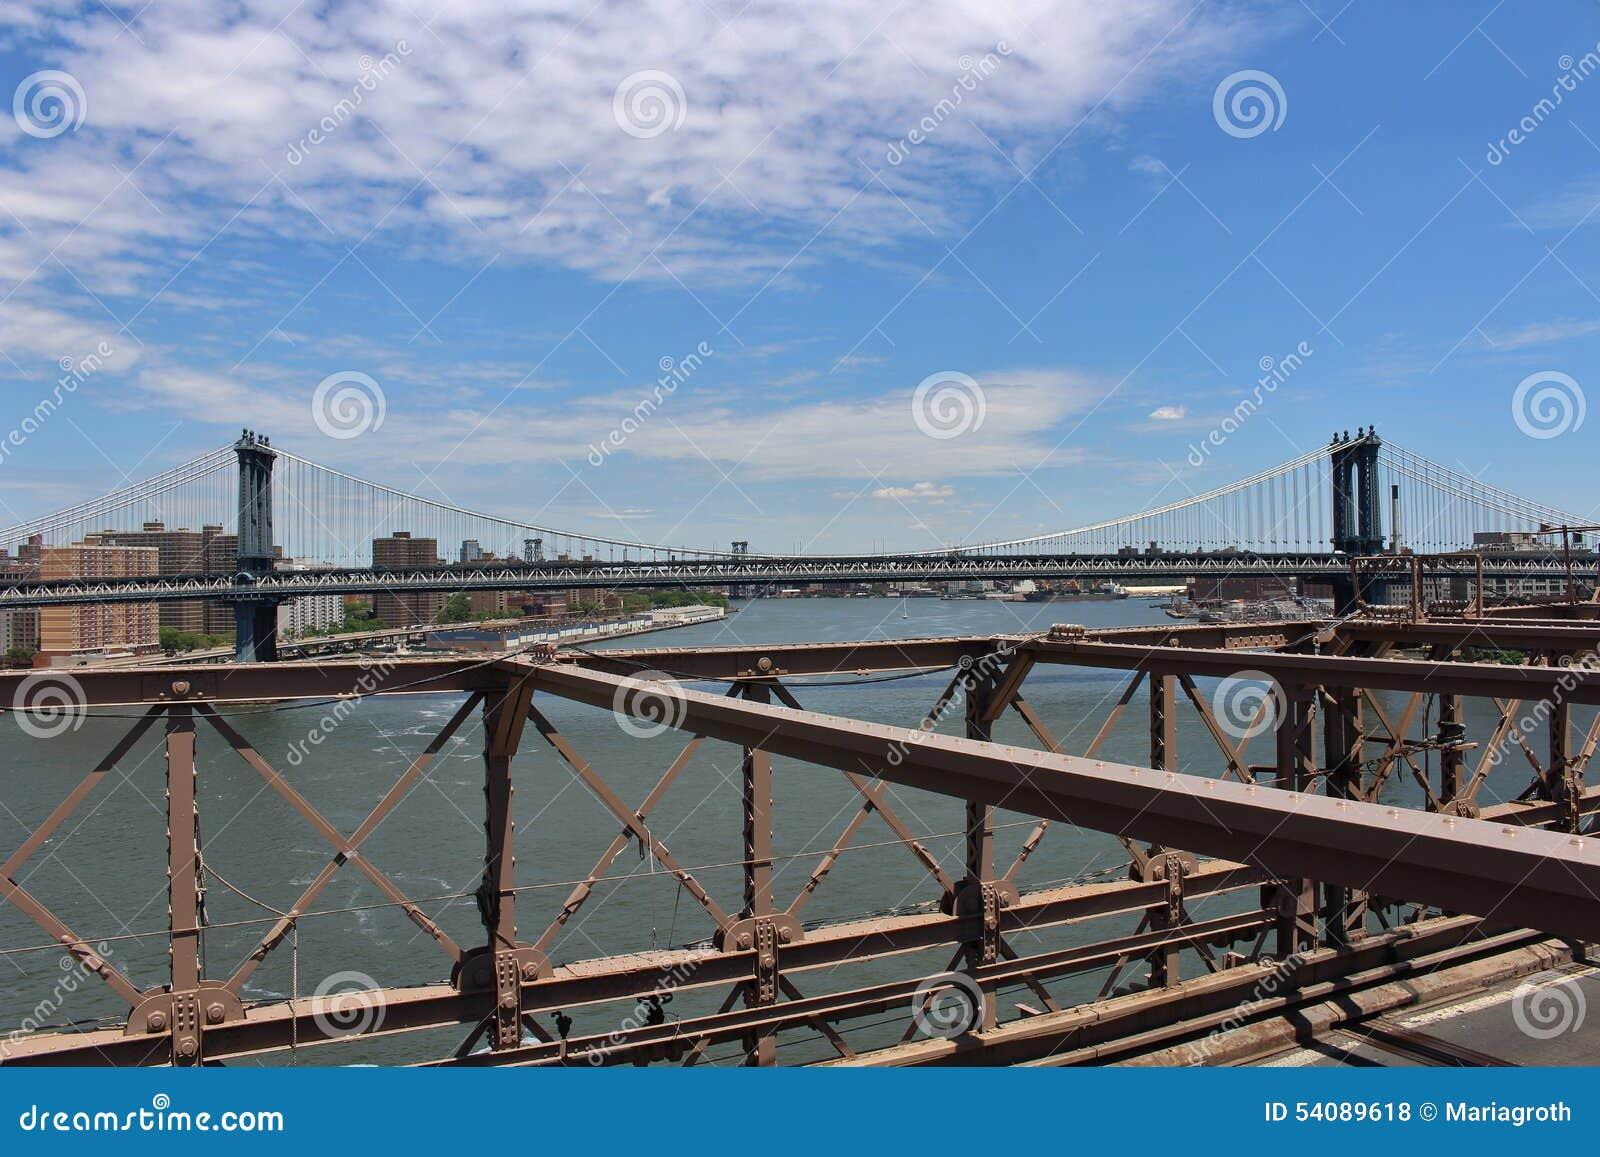 De brug van Brooklyn, New York